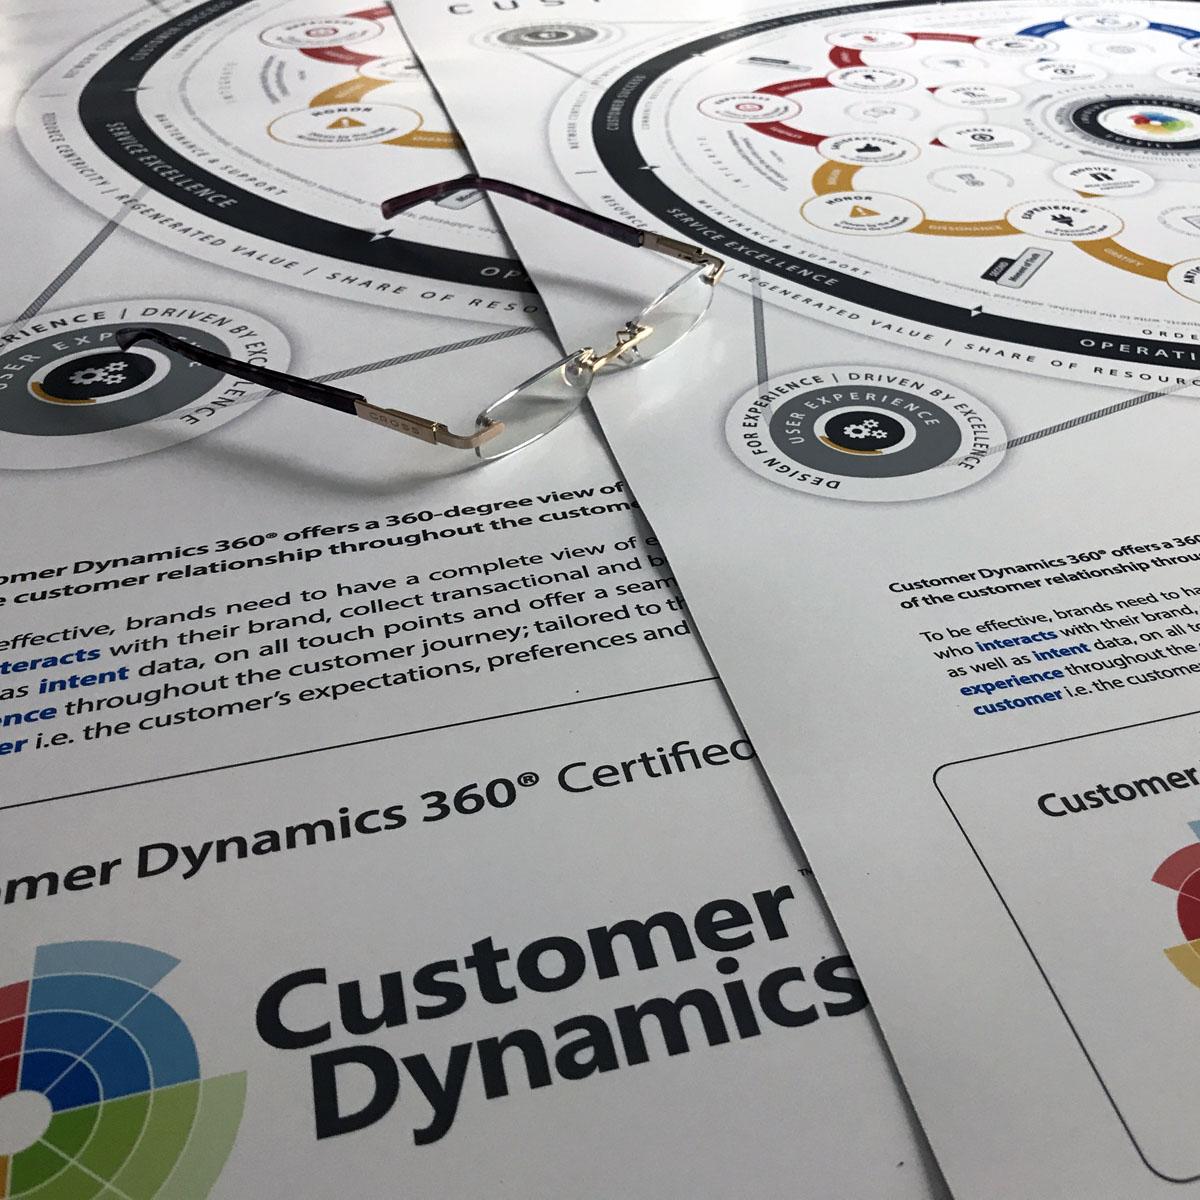 customer-dynamics-poster-01